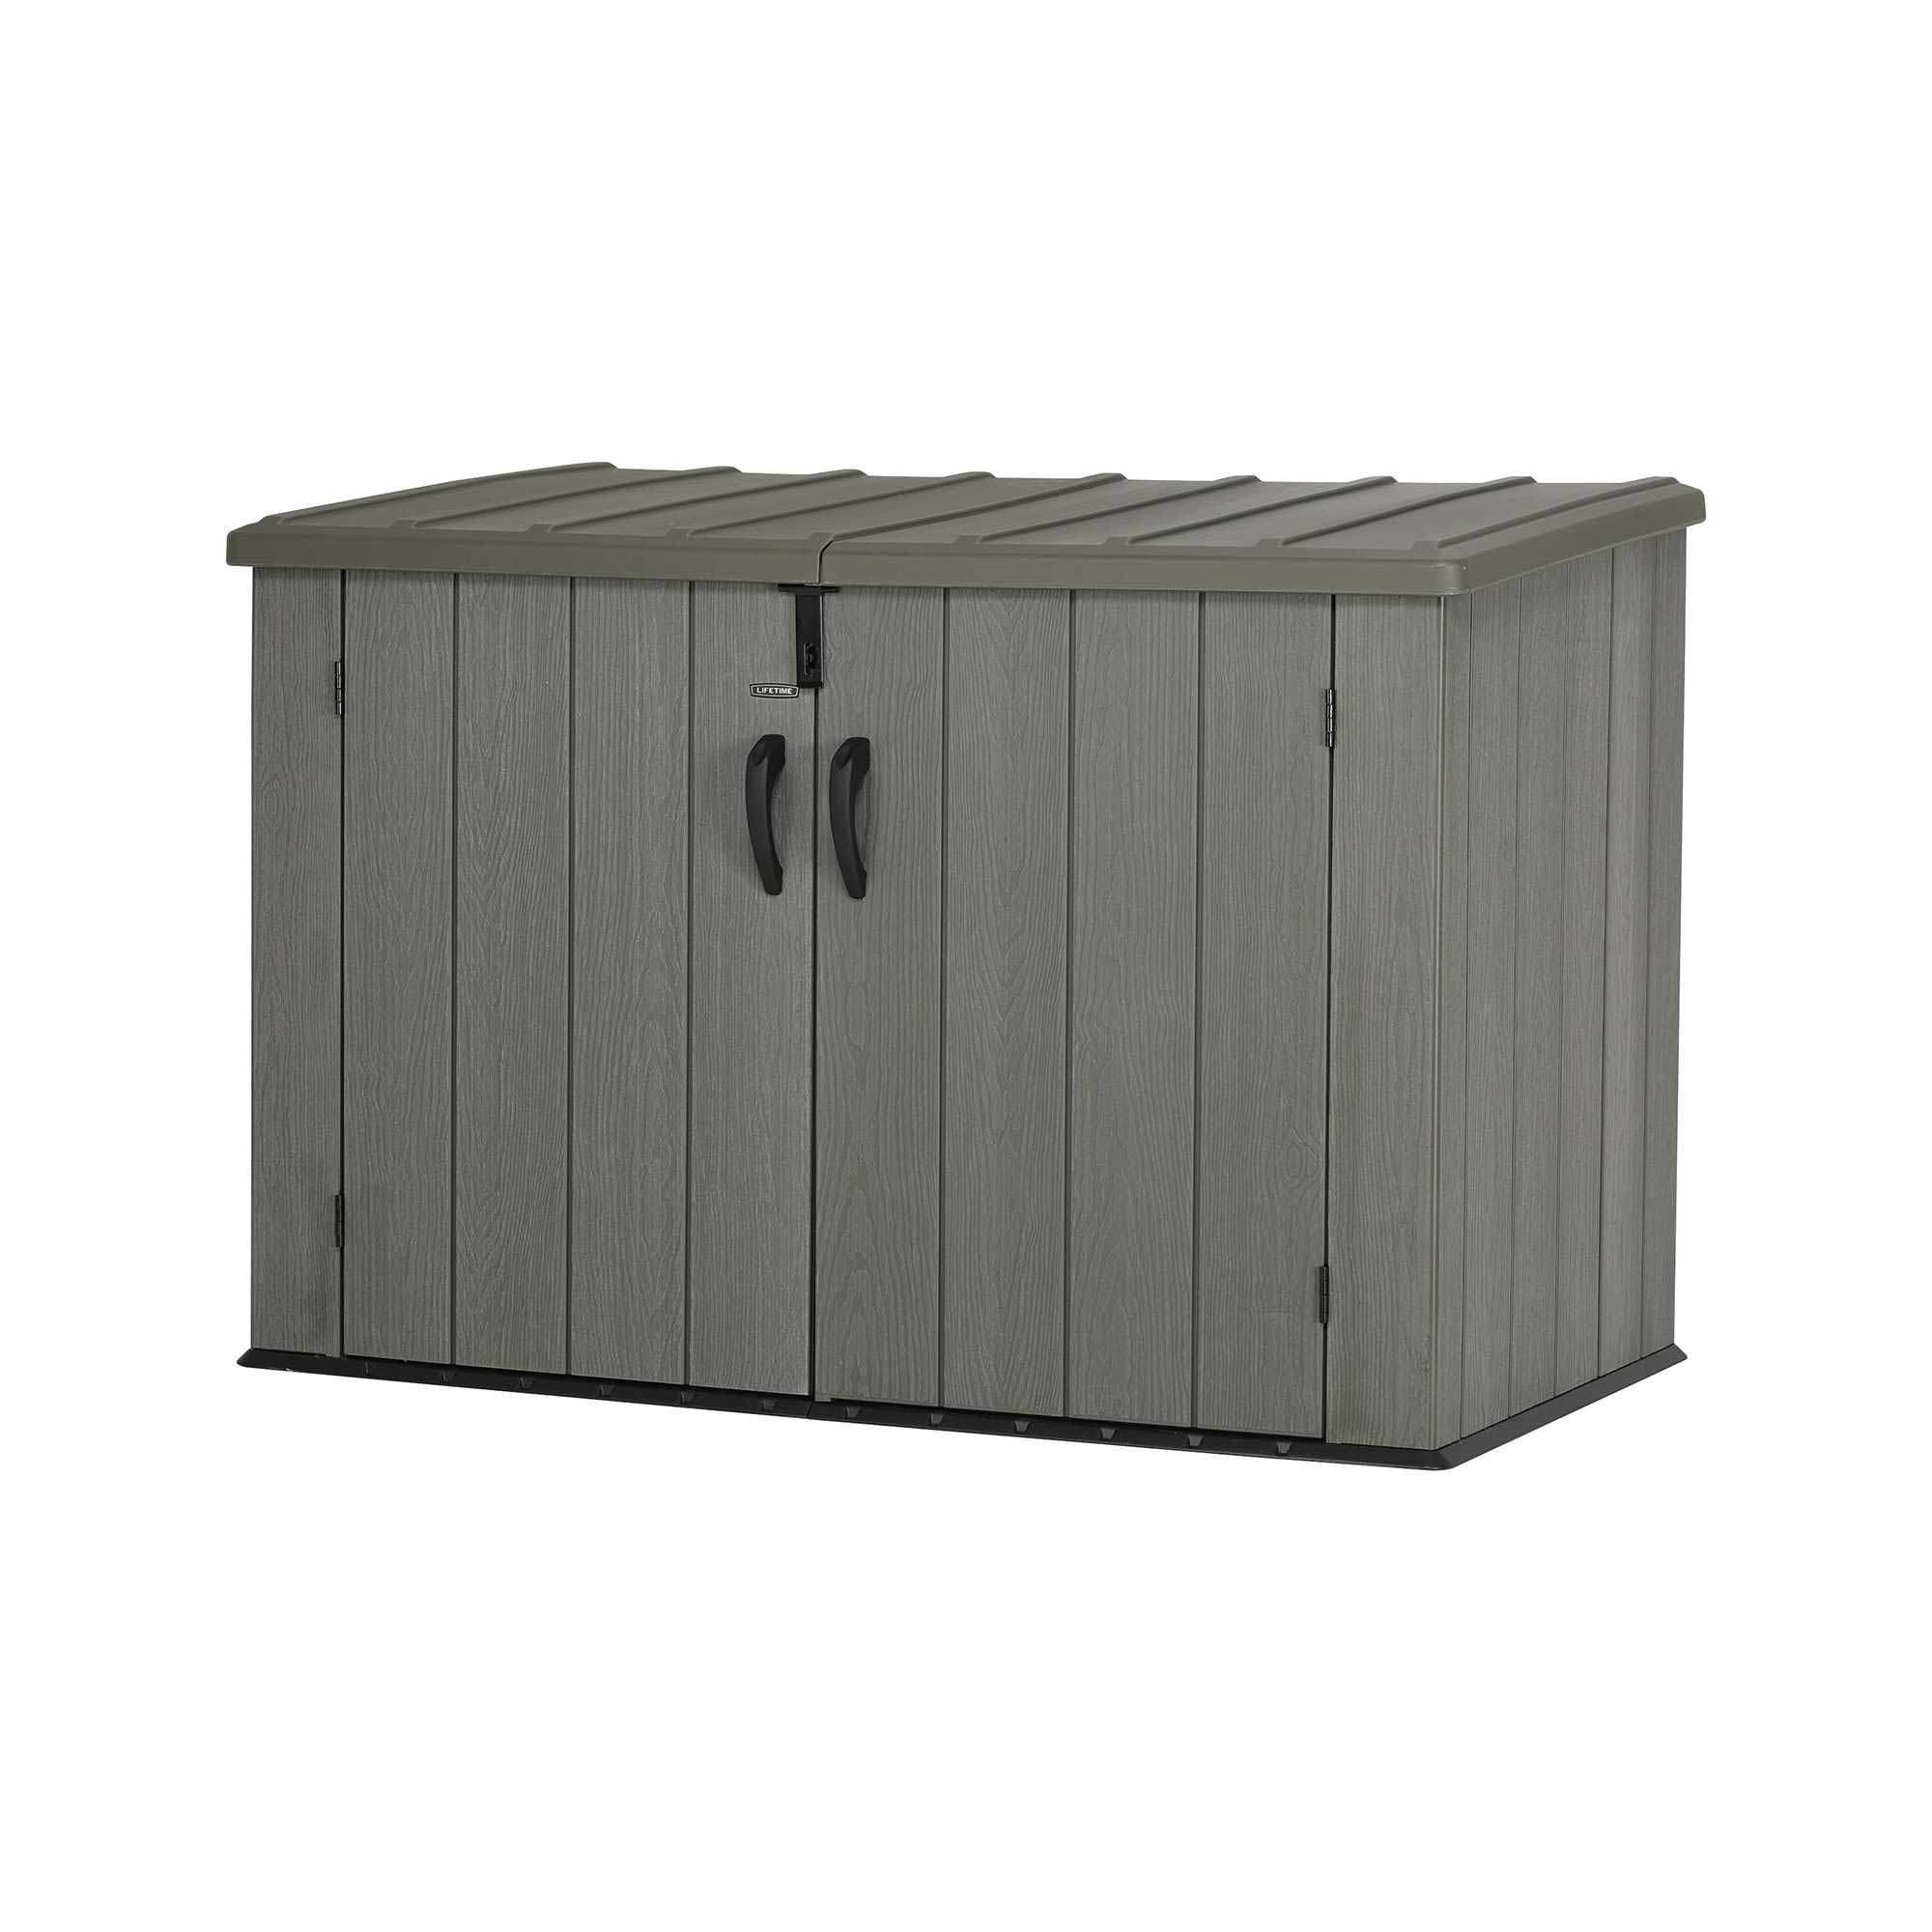 Lifetime Outdoor Garbage Bin 60212 Brown 6 Horizontal